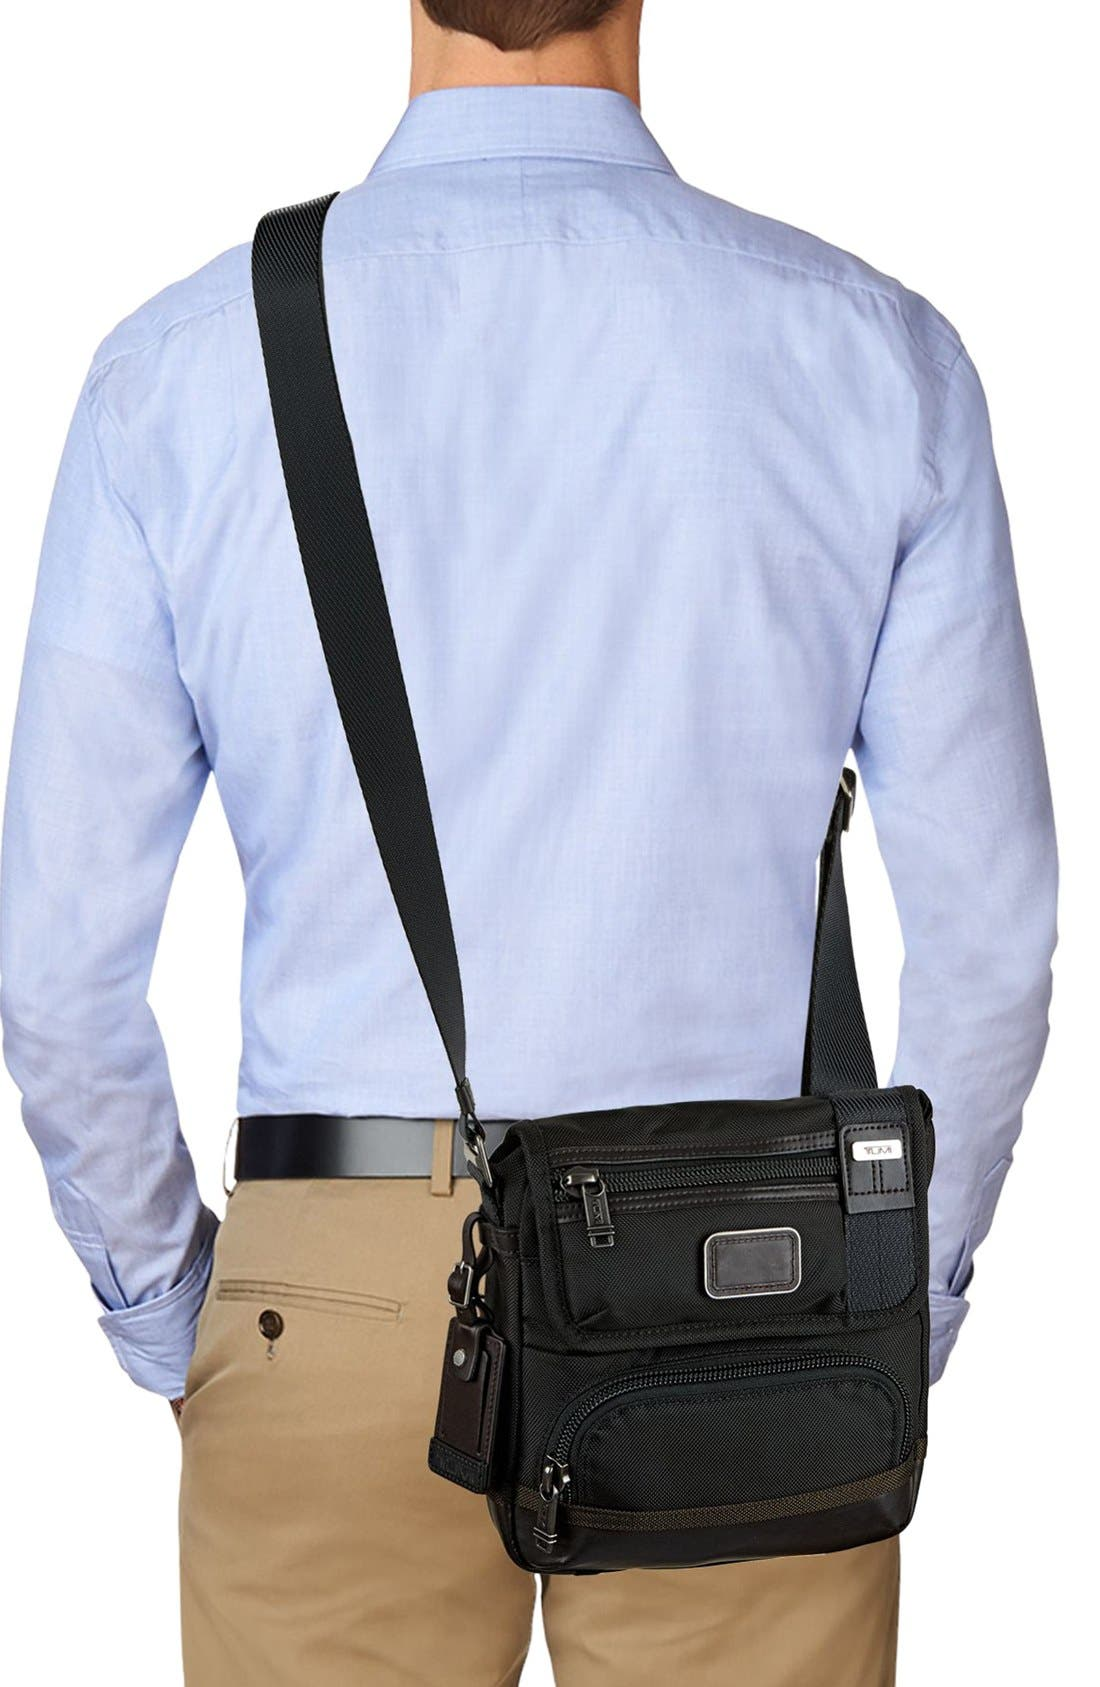 'Alpha Bravo - Barstow' Crossbody Bag,                             Alternate thumbnail 2, color,                             Hickory Black